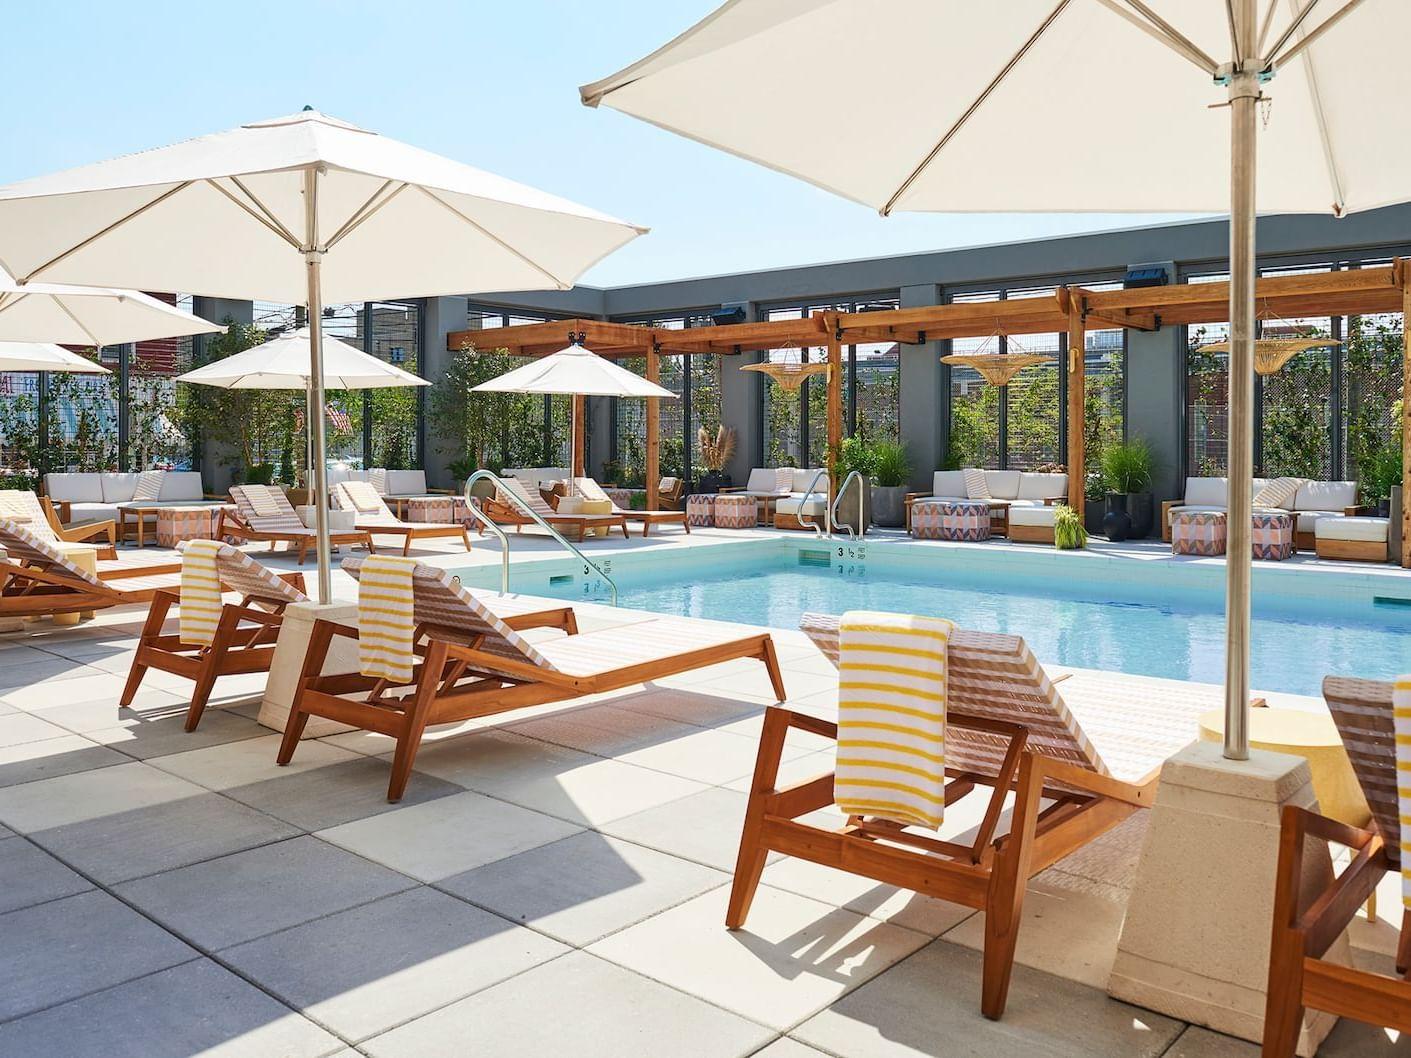 Sunbeds near Poolside Lounge at the Rockaway Hotel